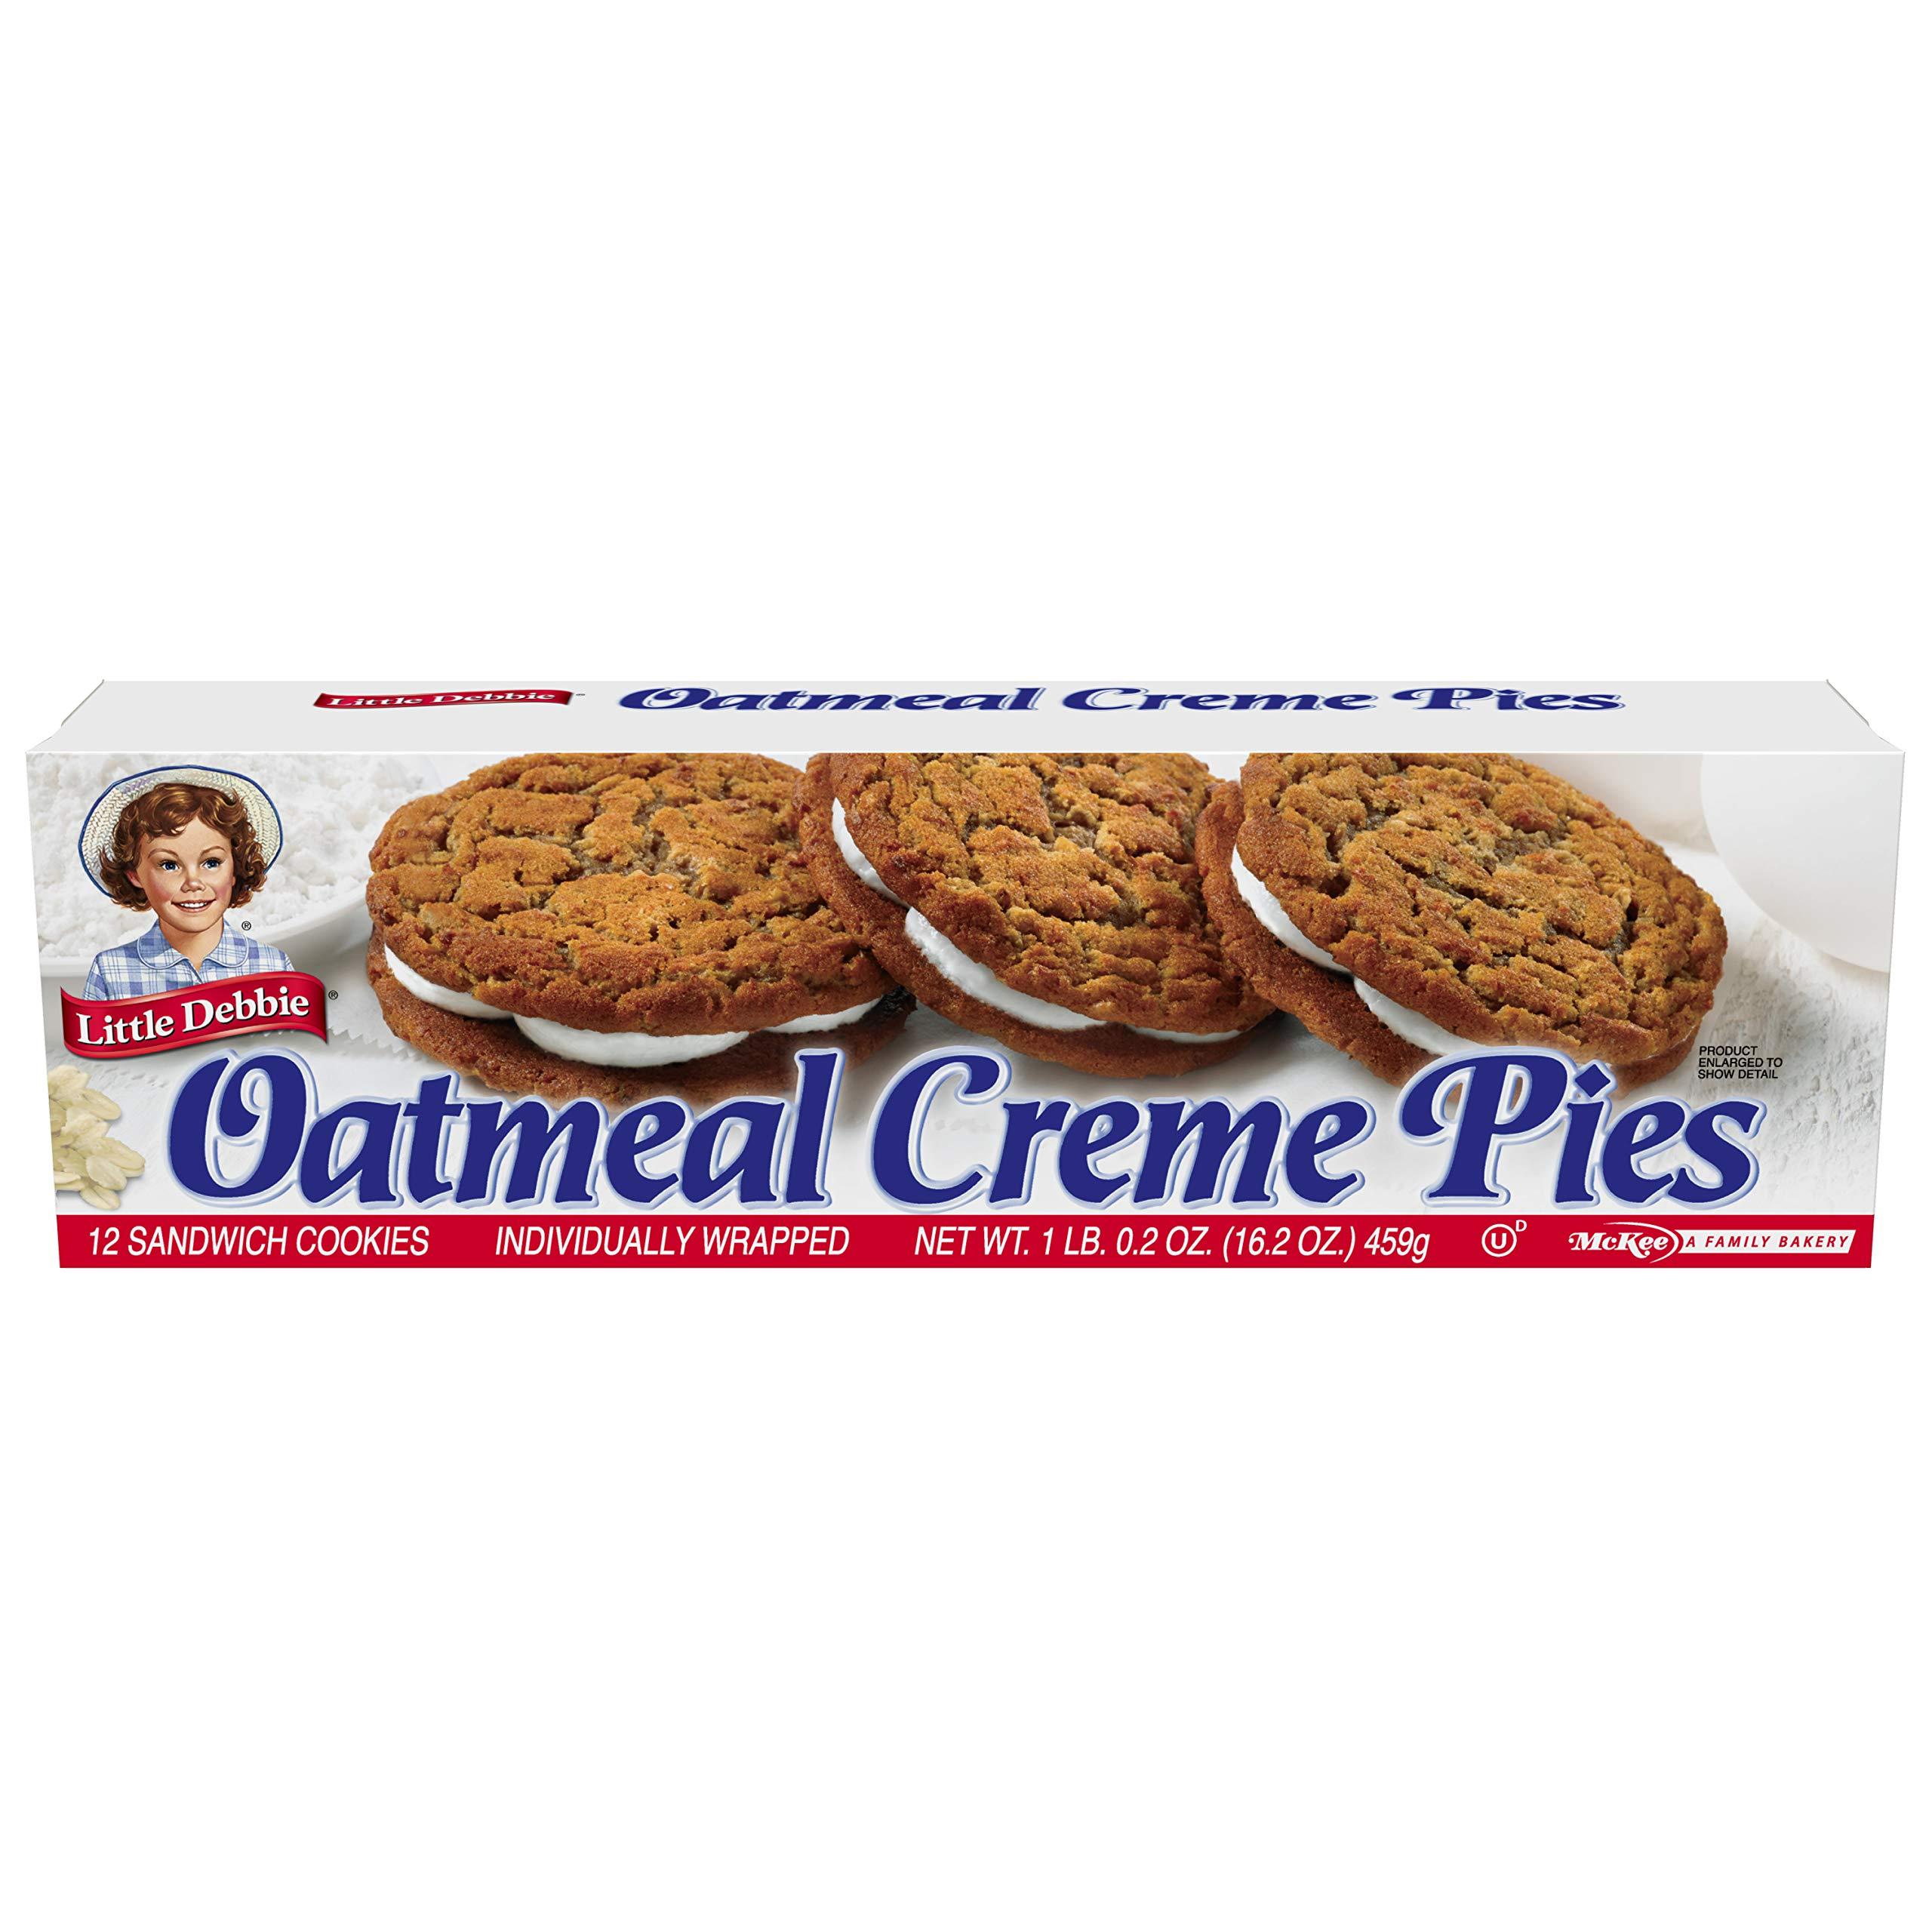 Little Debbie Oatmeal Creme Pies, 16 boxes